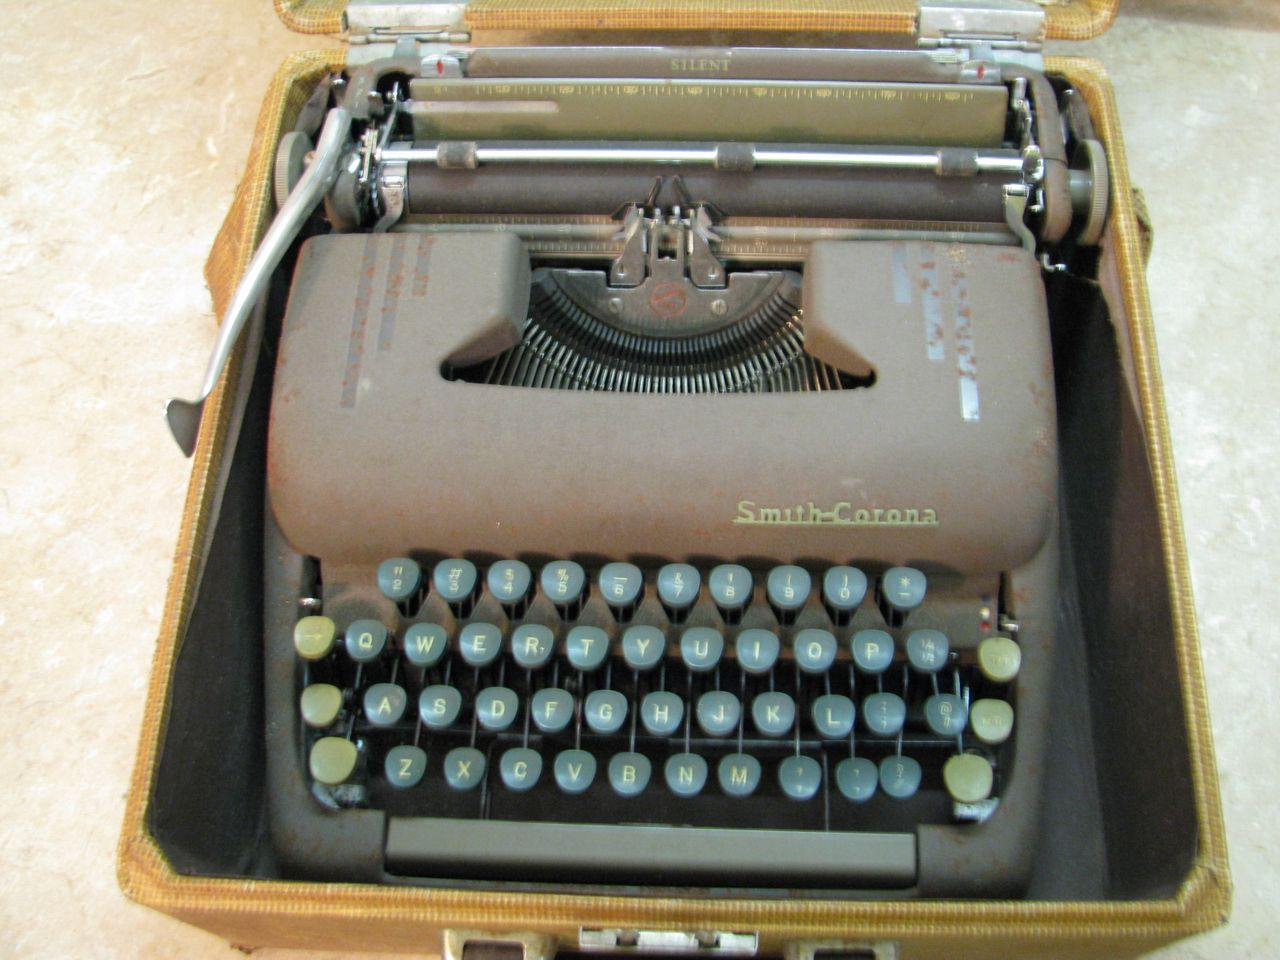 Smith Corona Typewriter Vintage 27